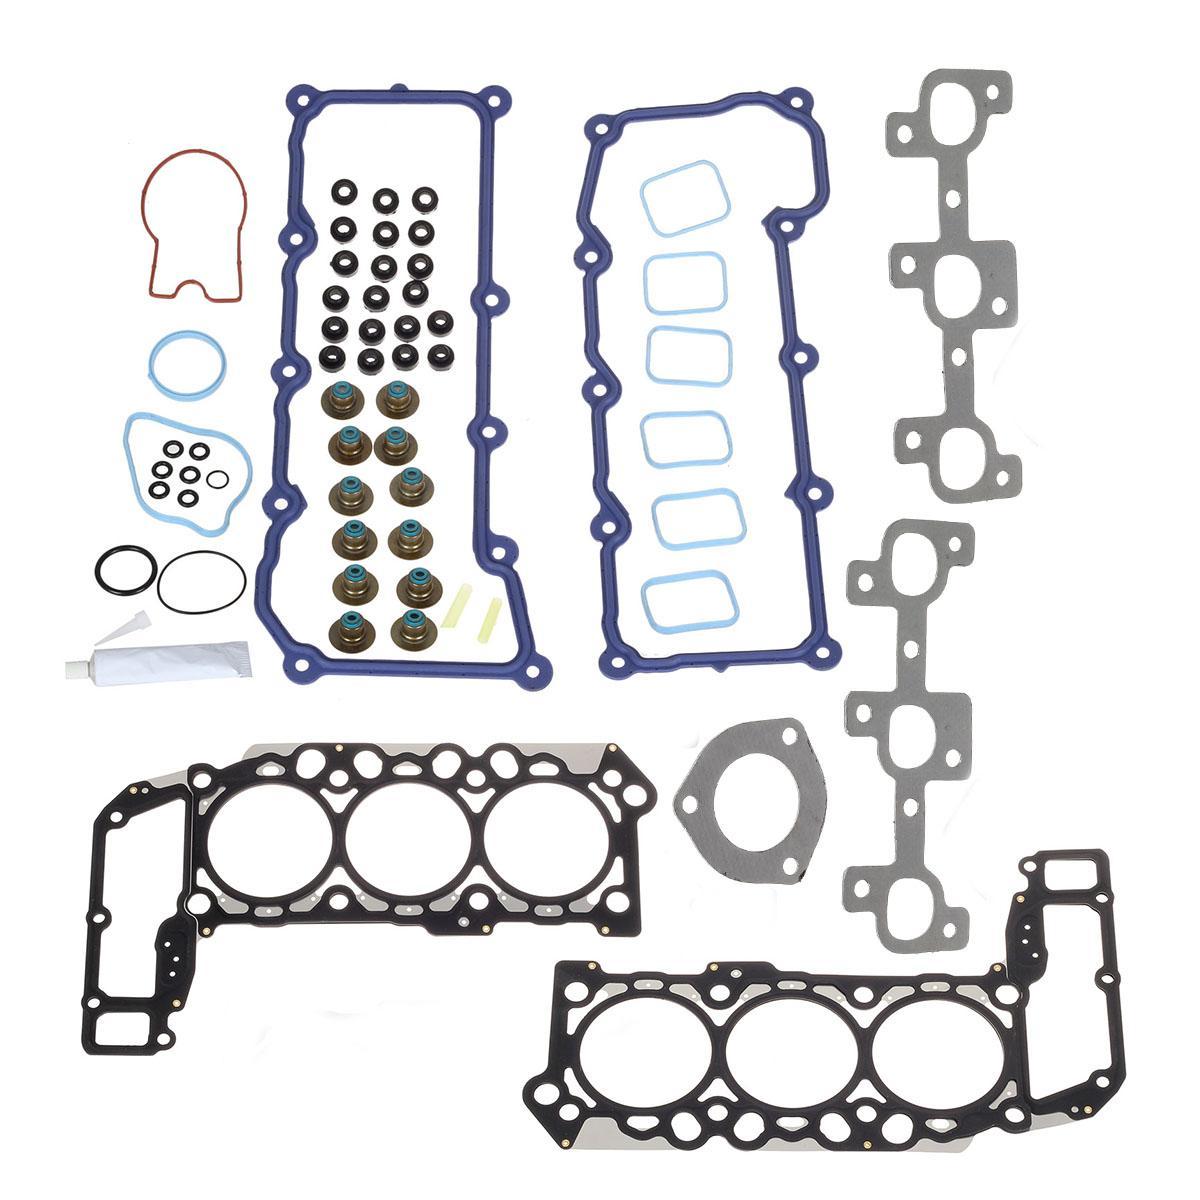 Cylinder Head Gasket Kit For Dodge Dakota Durango Ram 1500